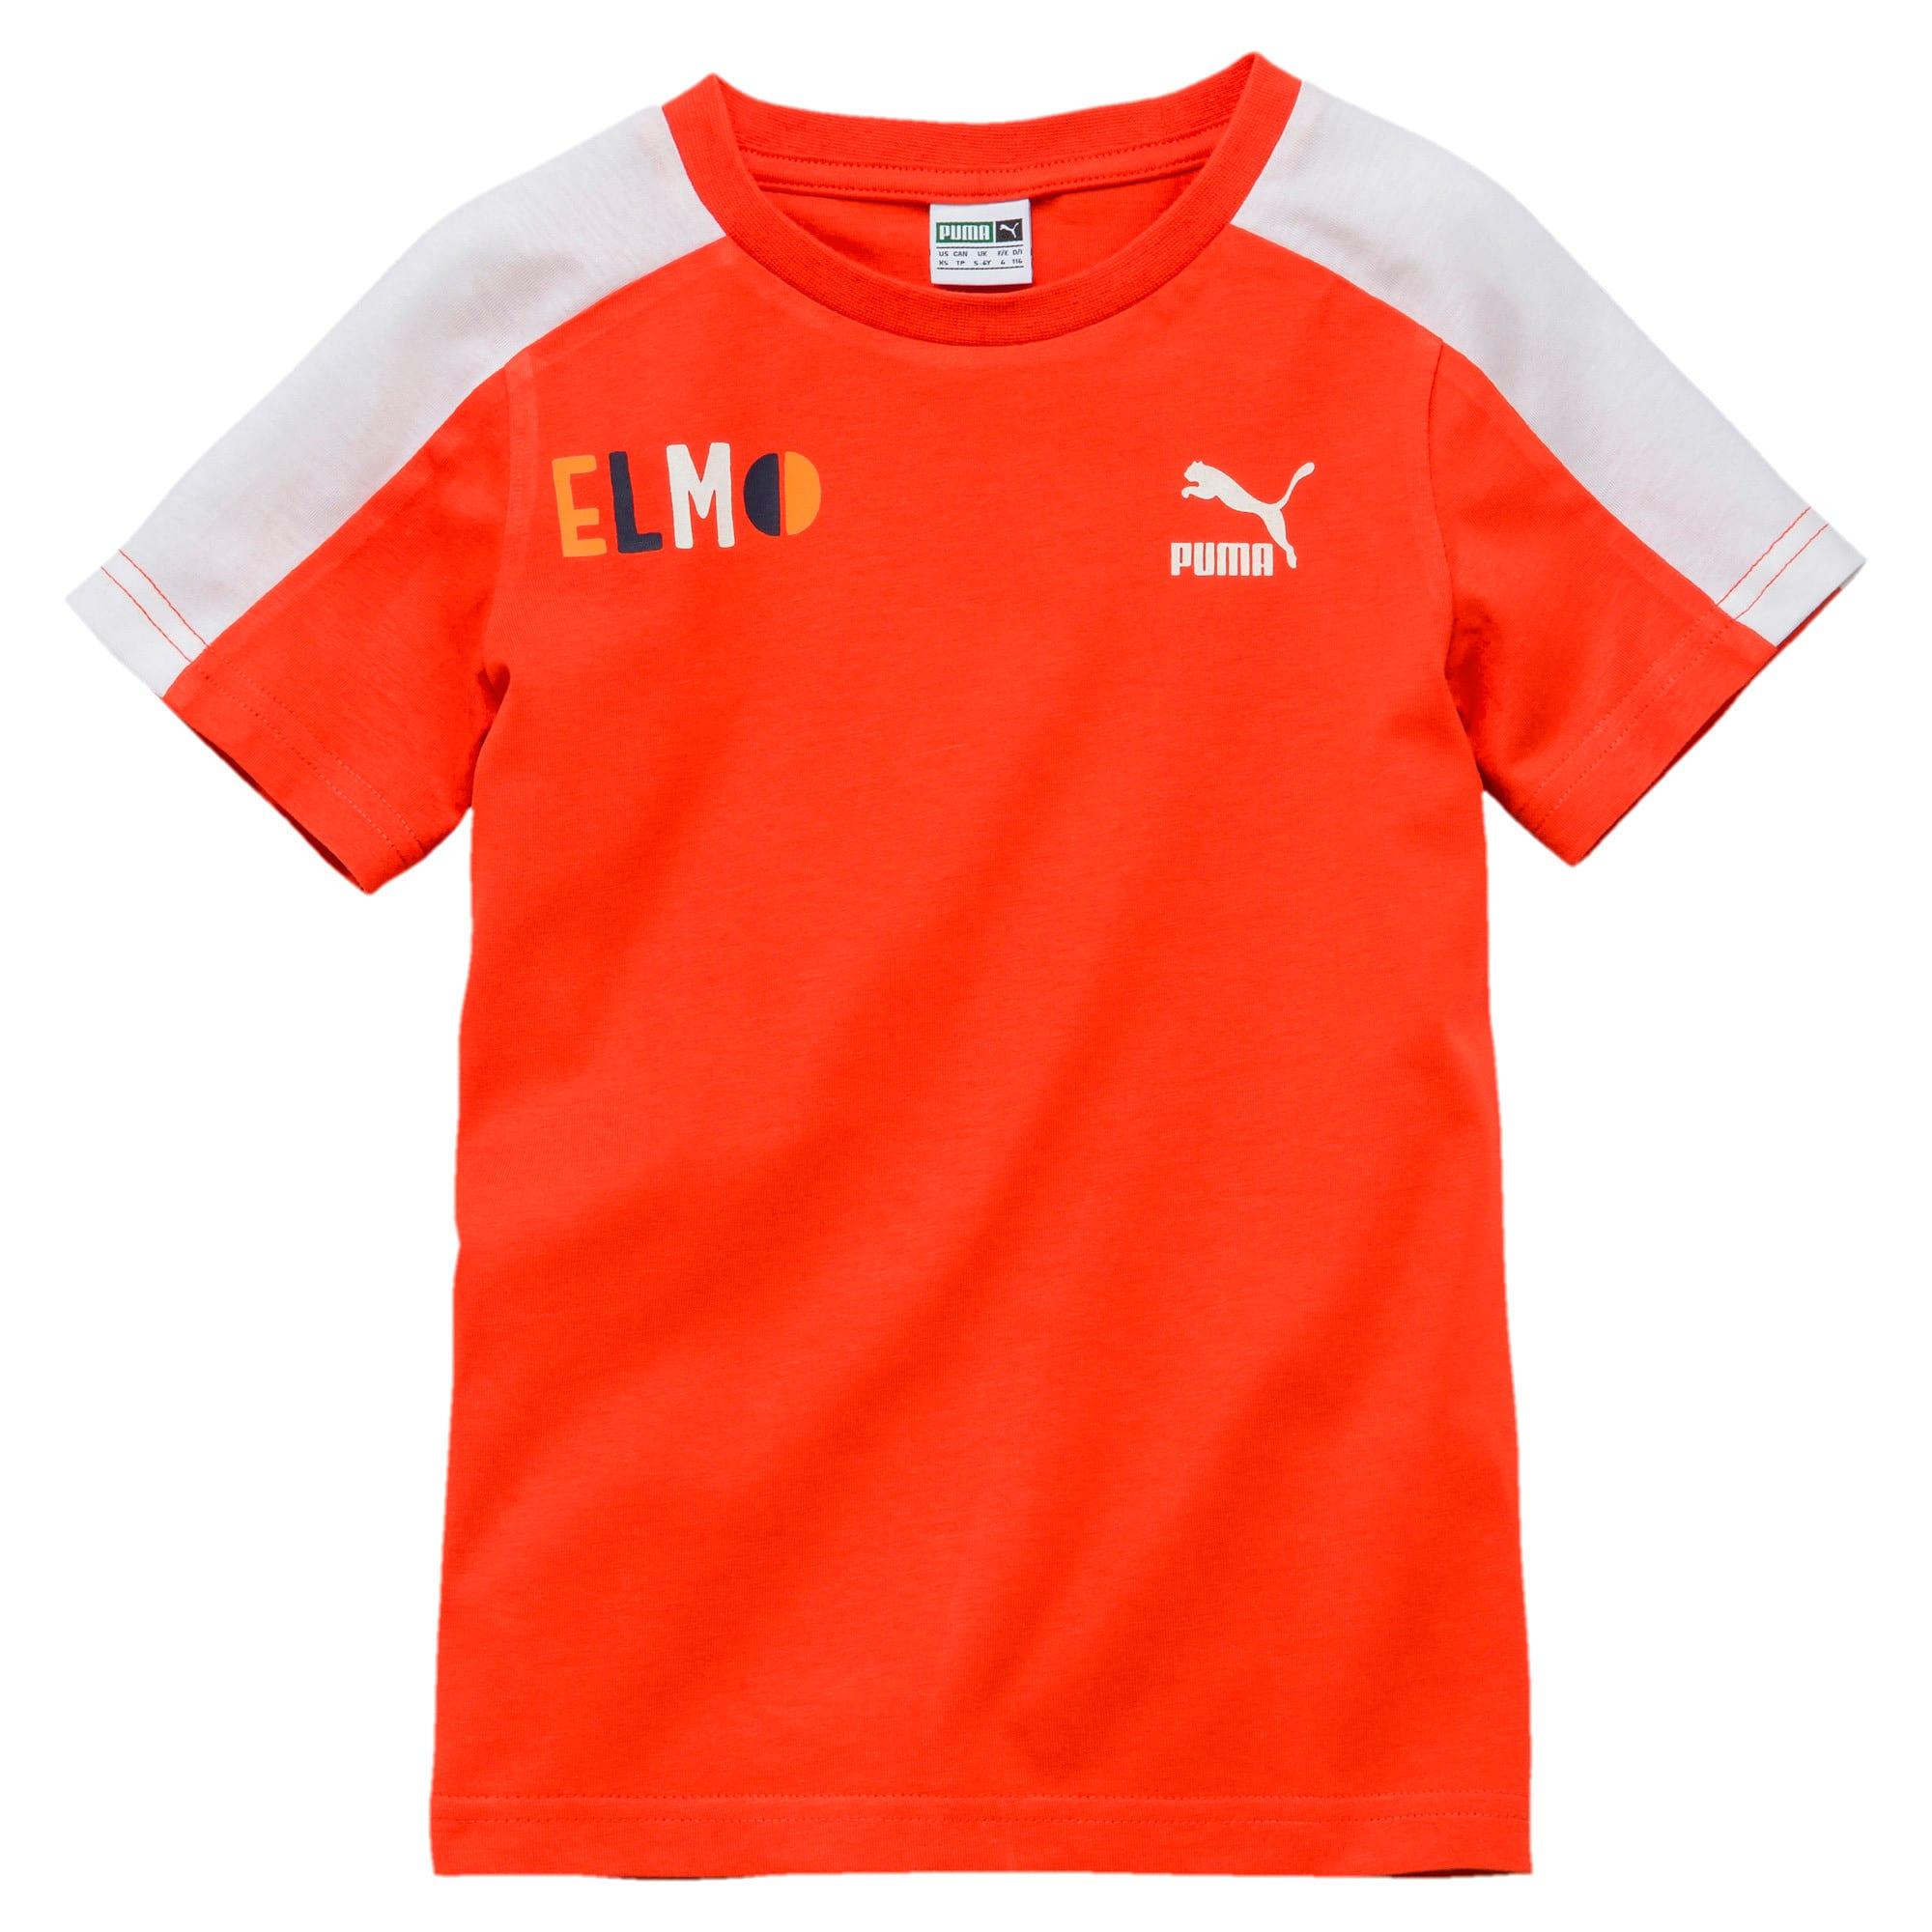 Miniatura 1 de Camiseta PUMA x SESAME STREET para niño, Cherry Tomato-tigerlily, mediano